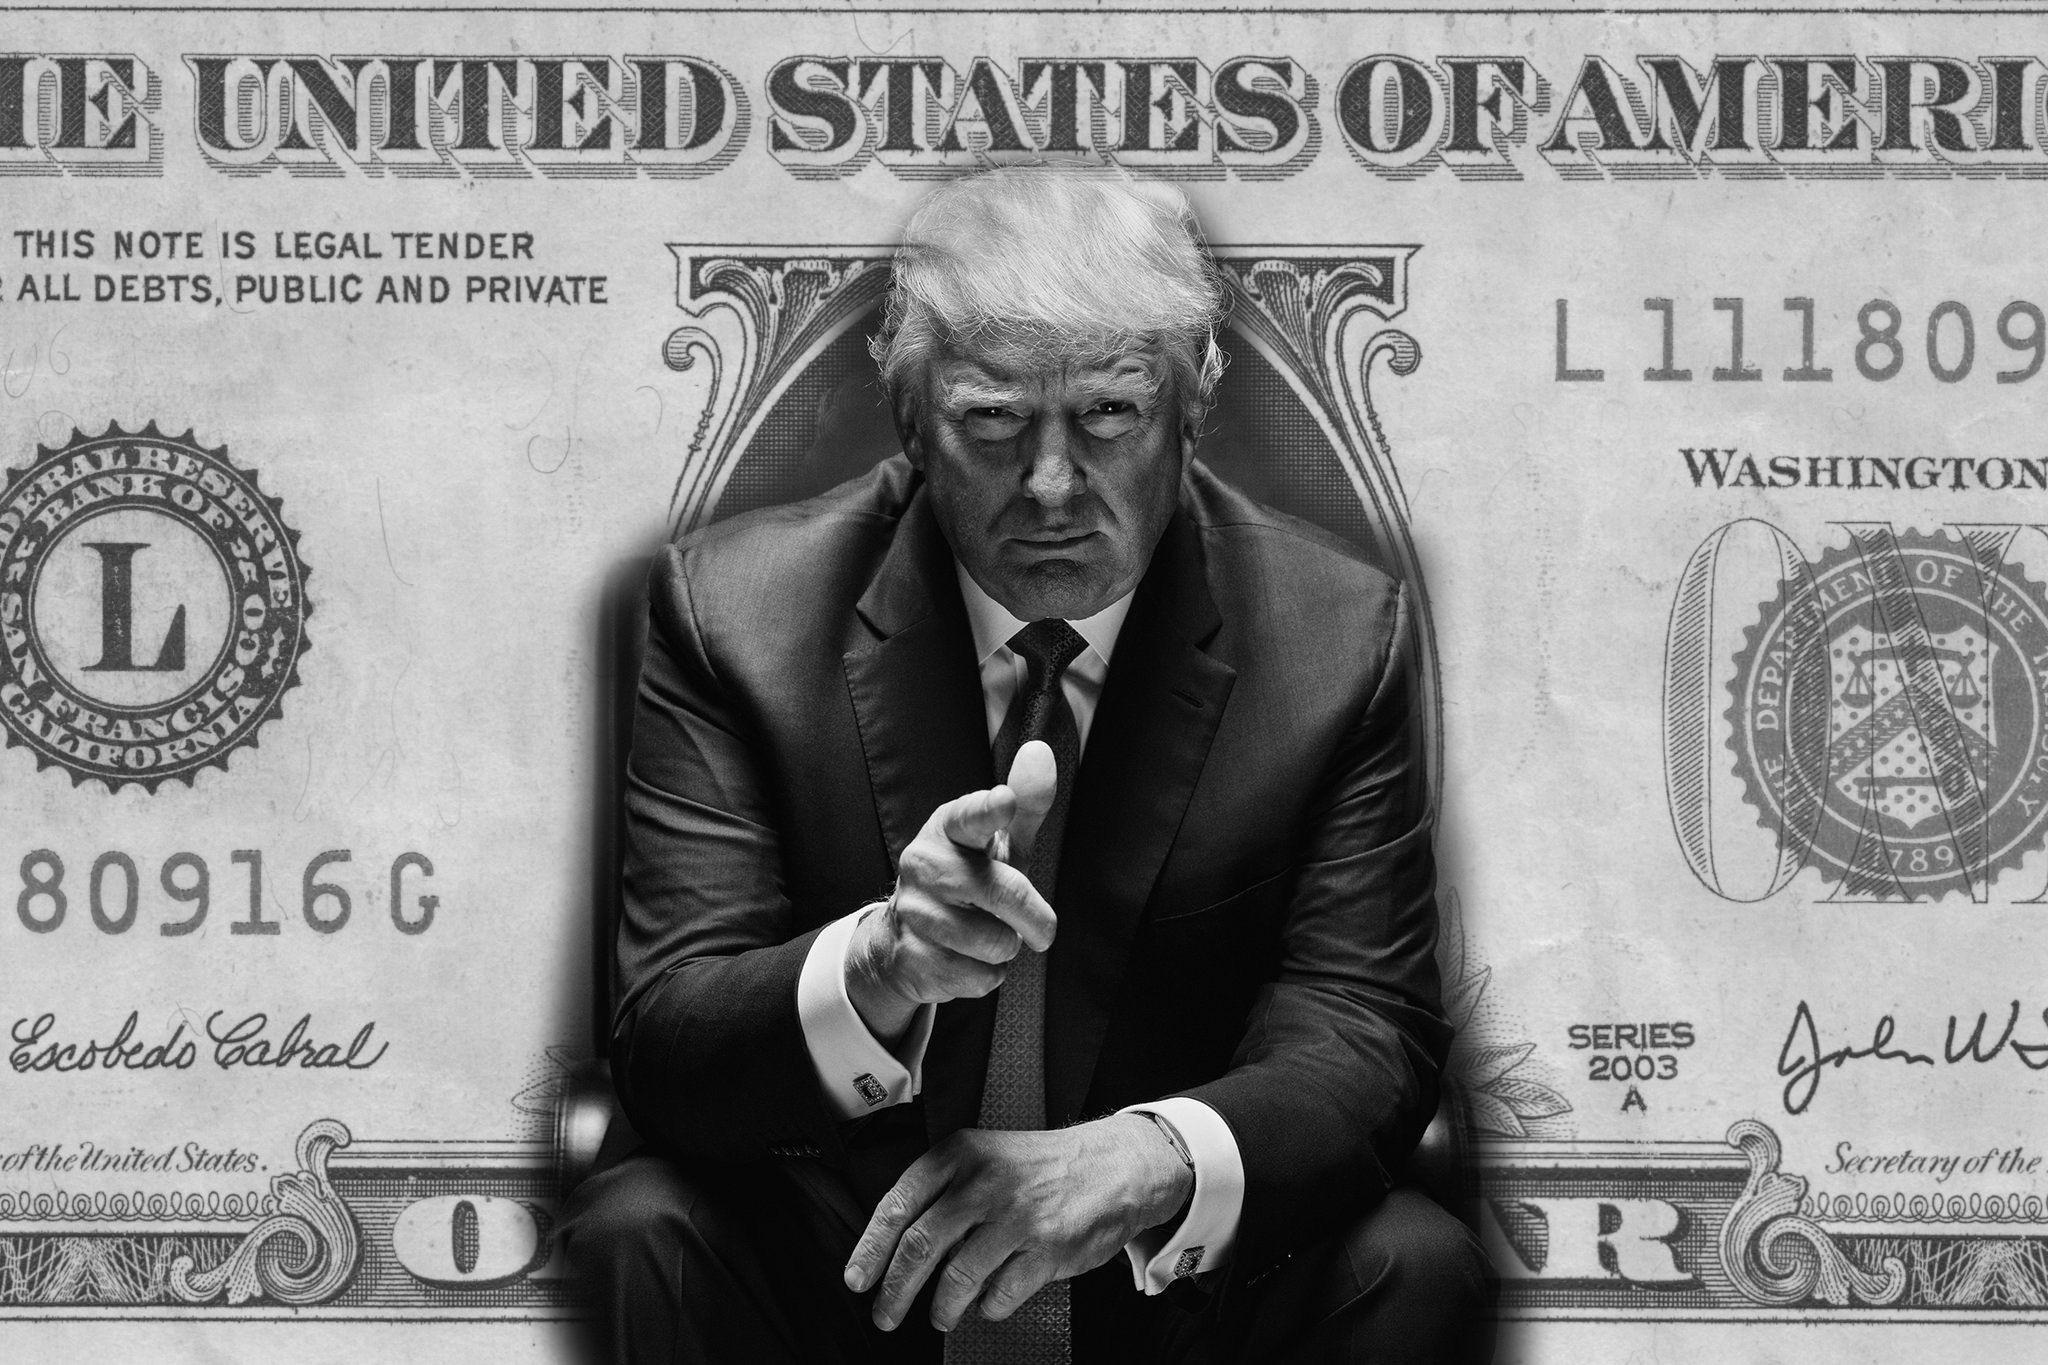 Trump Wallpaper Download Free Cool Backgrounds For Desktop